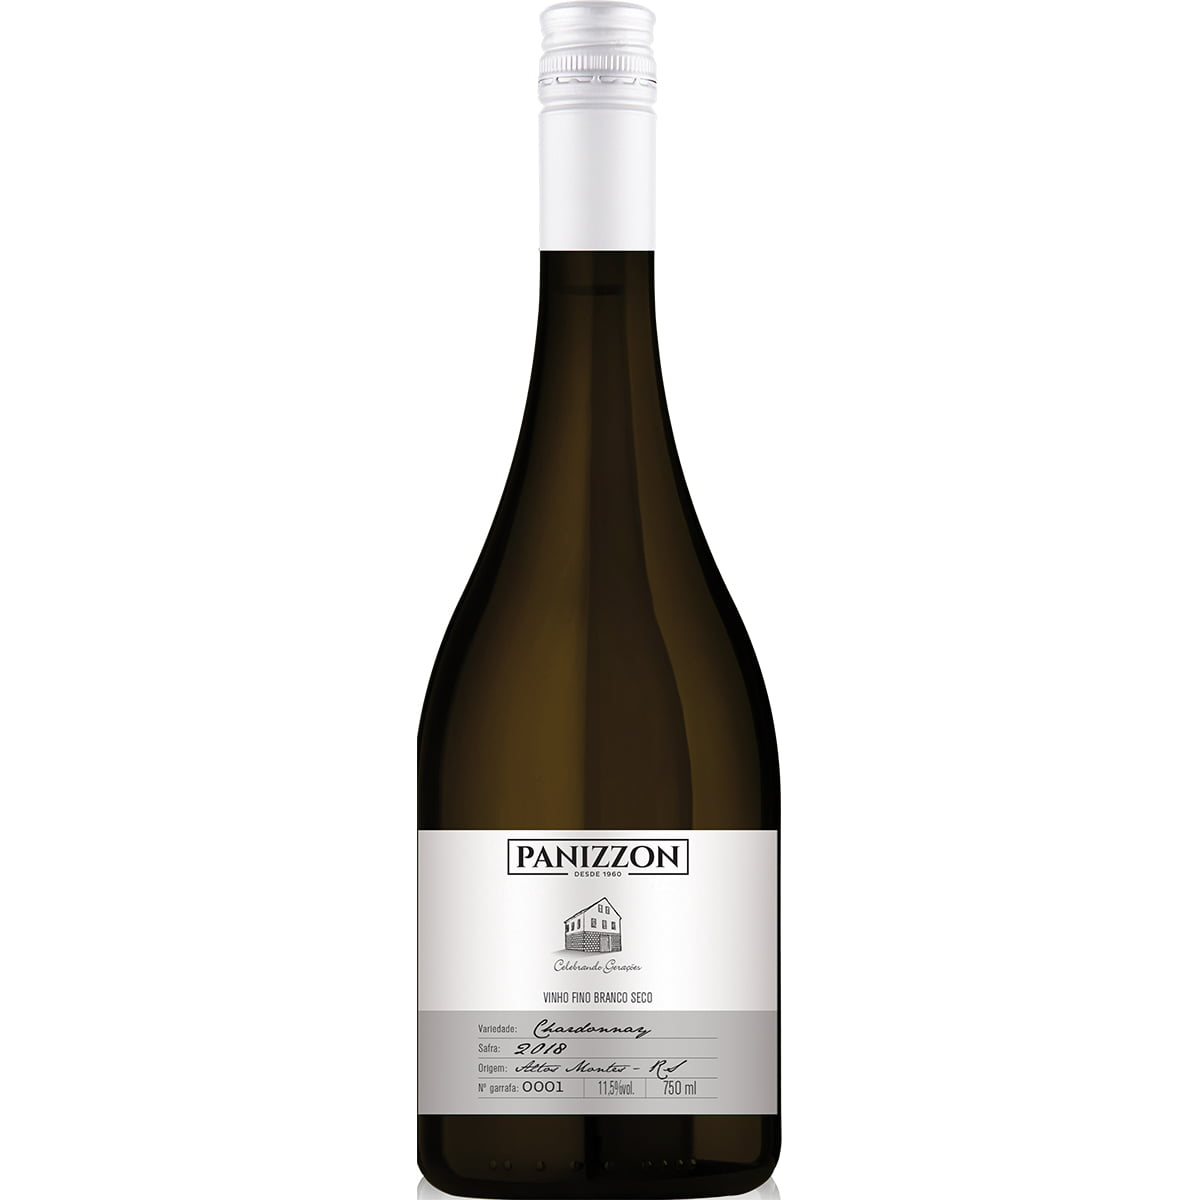 Vinho Panizzon Chardonnay Branco Seco 750ml